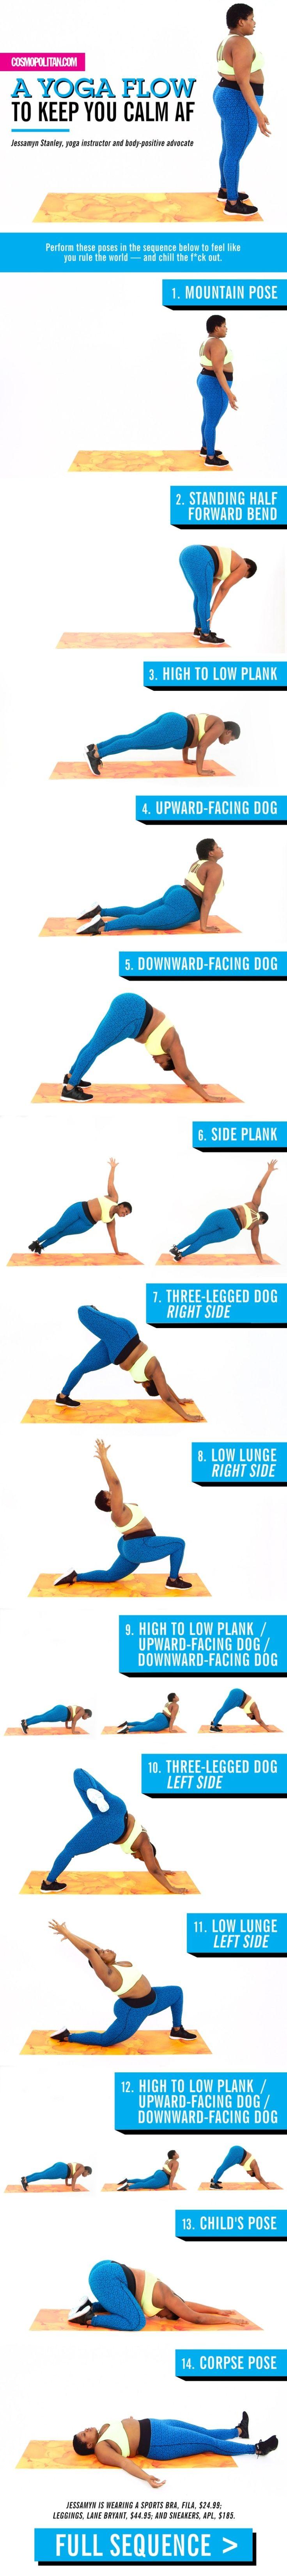 Best Yoga for Relaxation - Jessamyn Stanley Yoga Workout